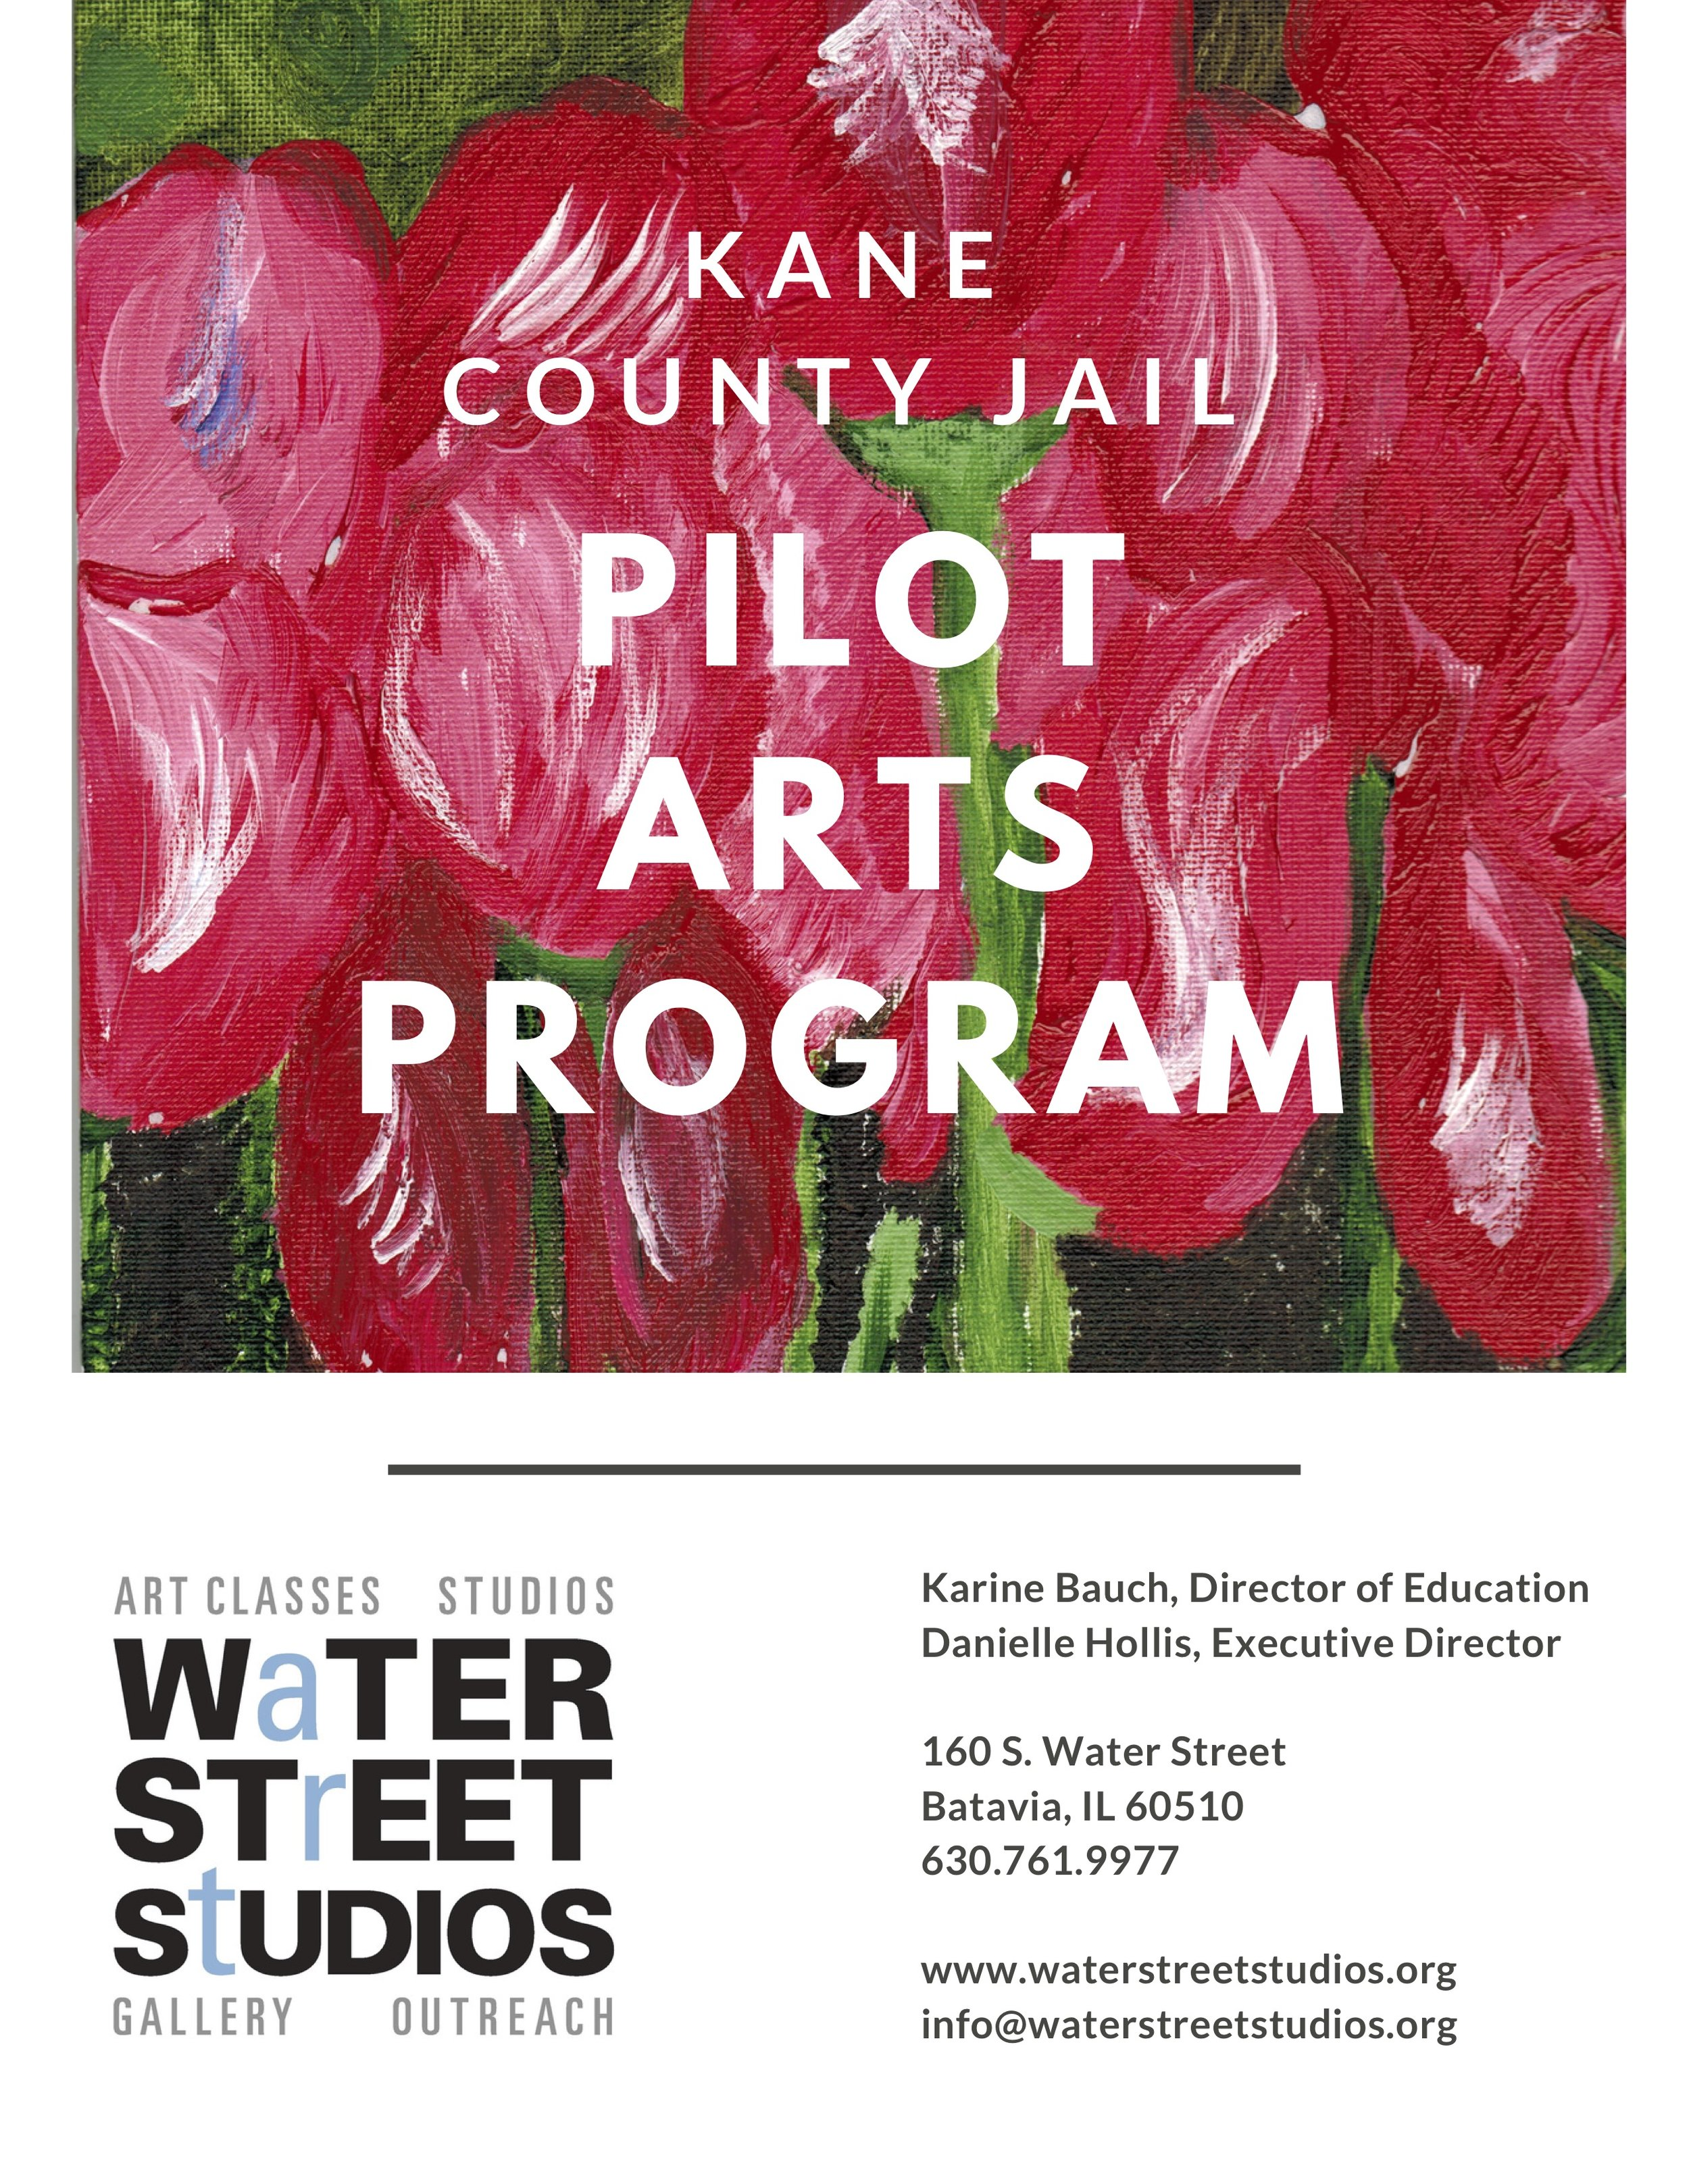 KCJ Pilot Arts Program Report - low res (1).jpg